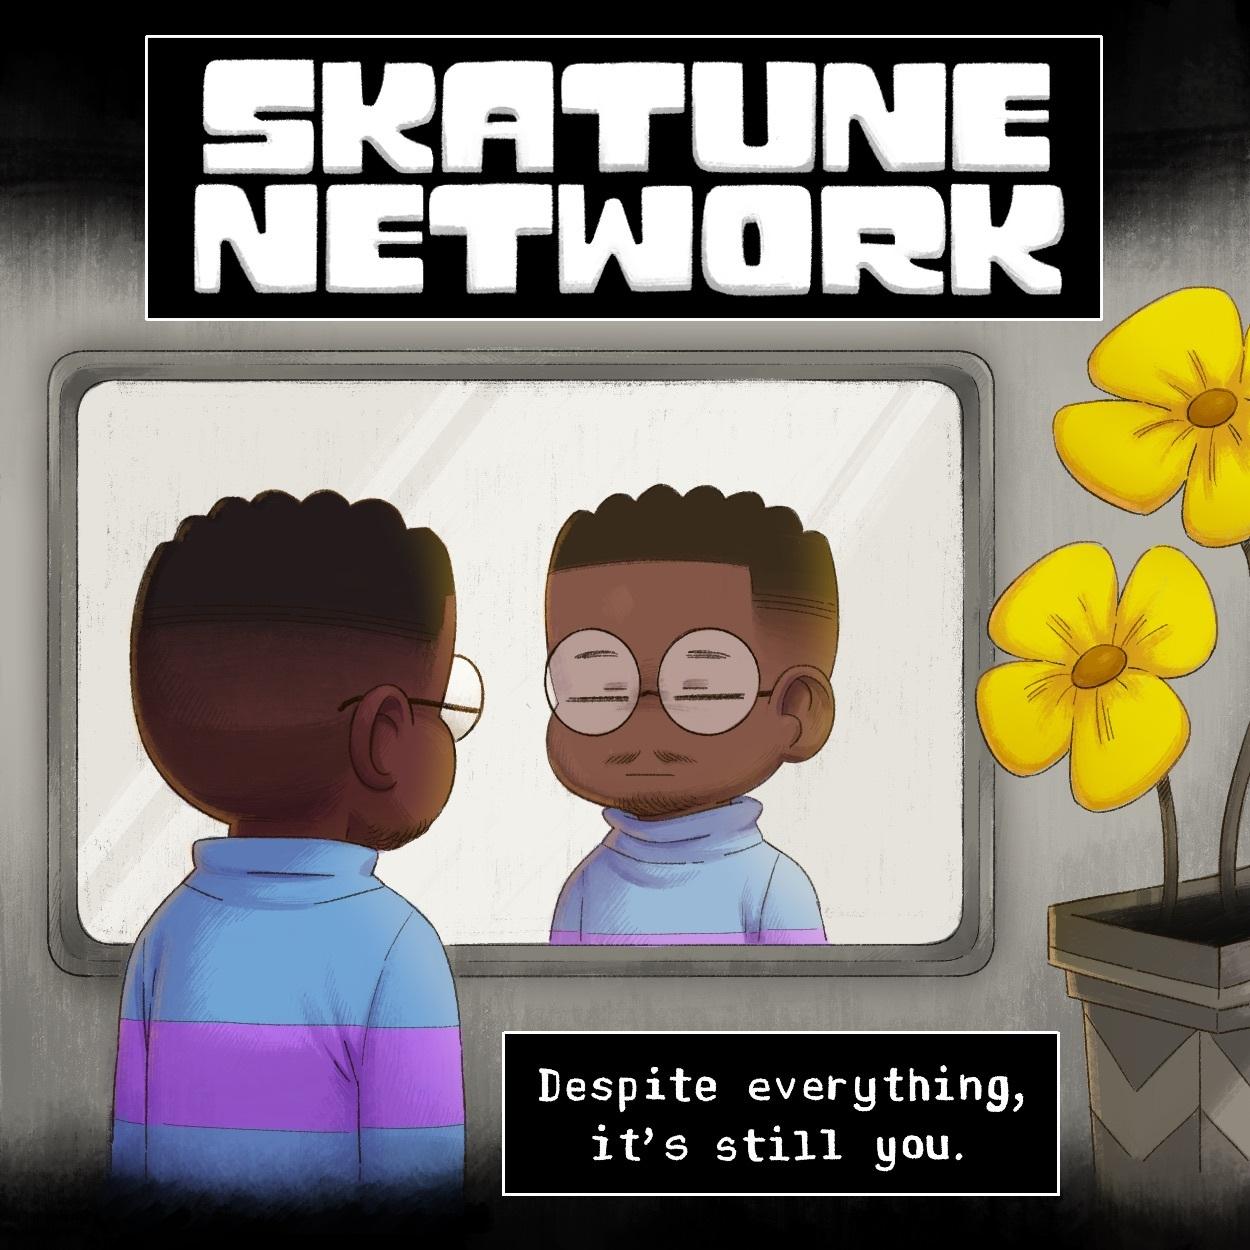 Skatune Network's new album cover art